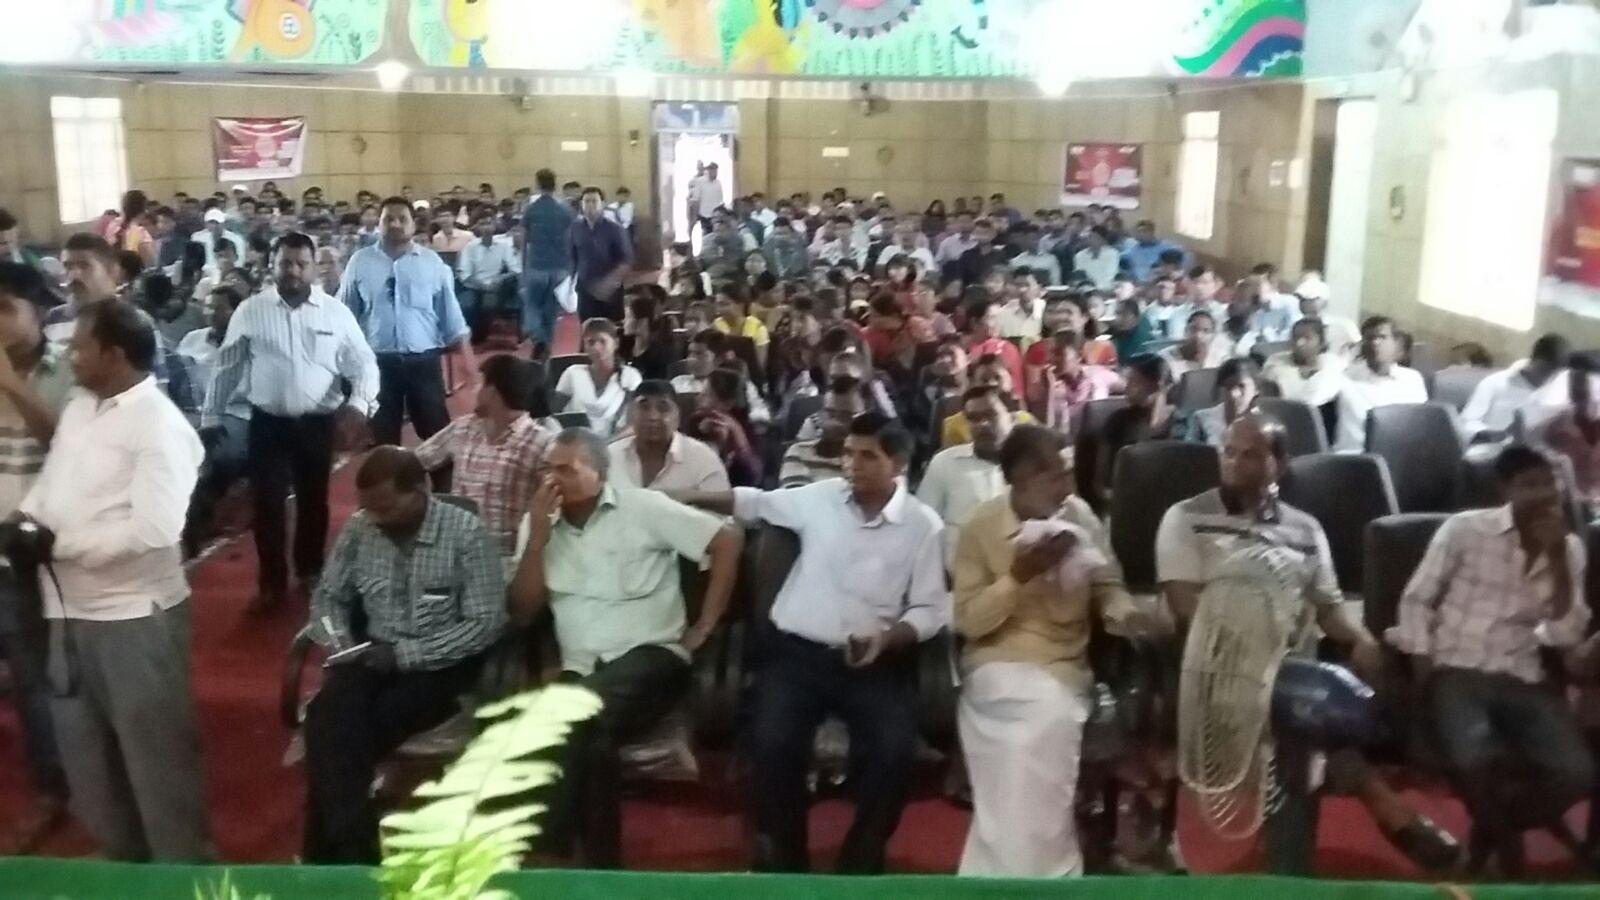 People attending Prabhat Khabar Pratibha Samman Samaroh at BNMU .